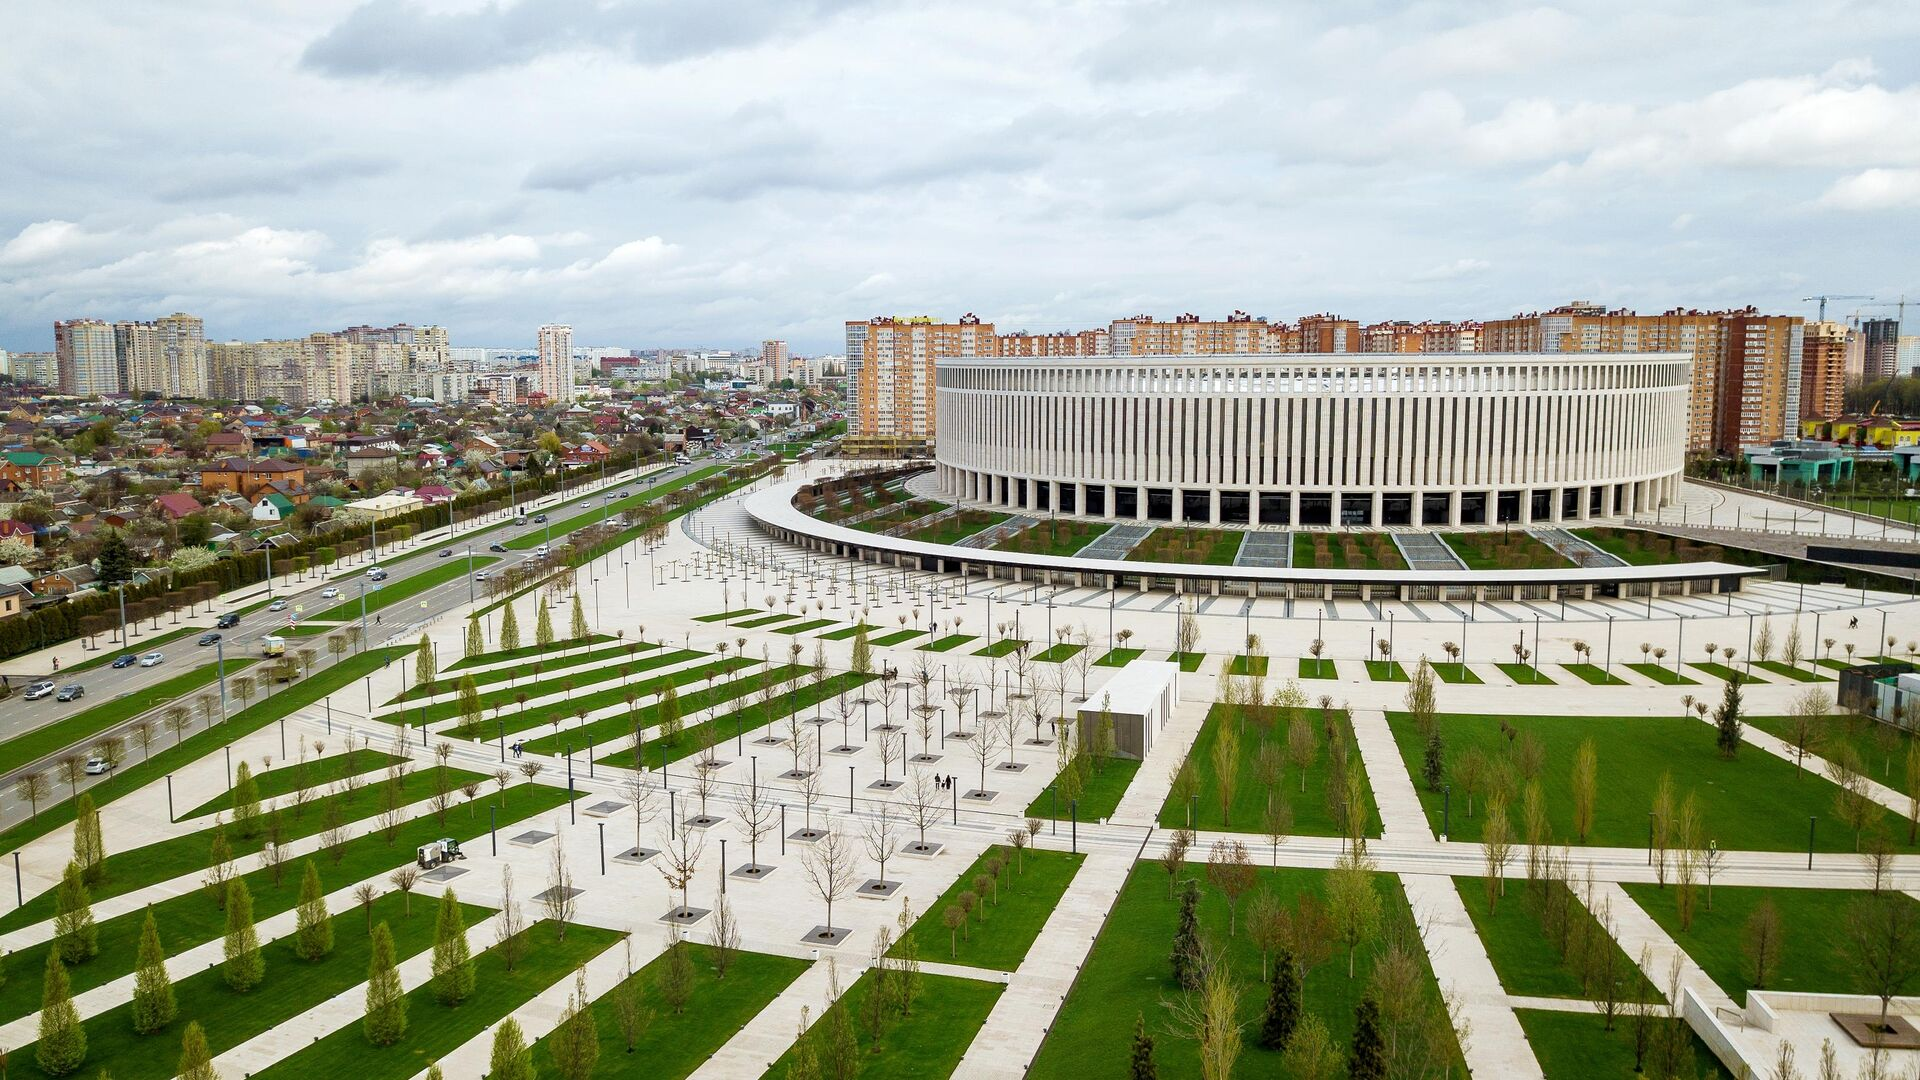 Территория парка возле стадиона ФК Краснодар - РИА Новости, 1920, 28.07.2021